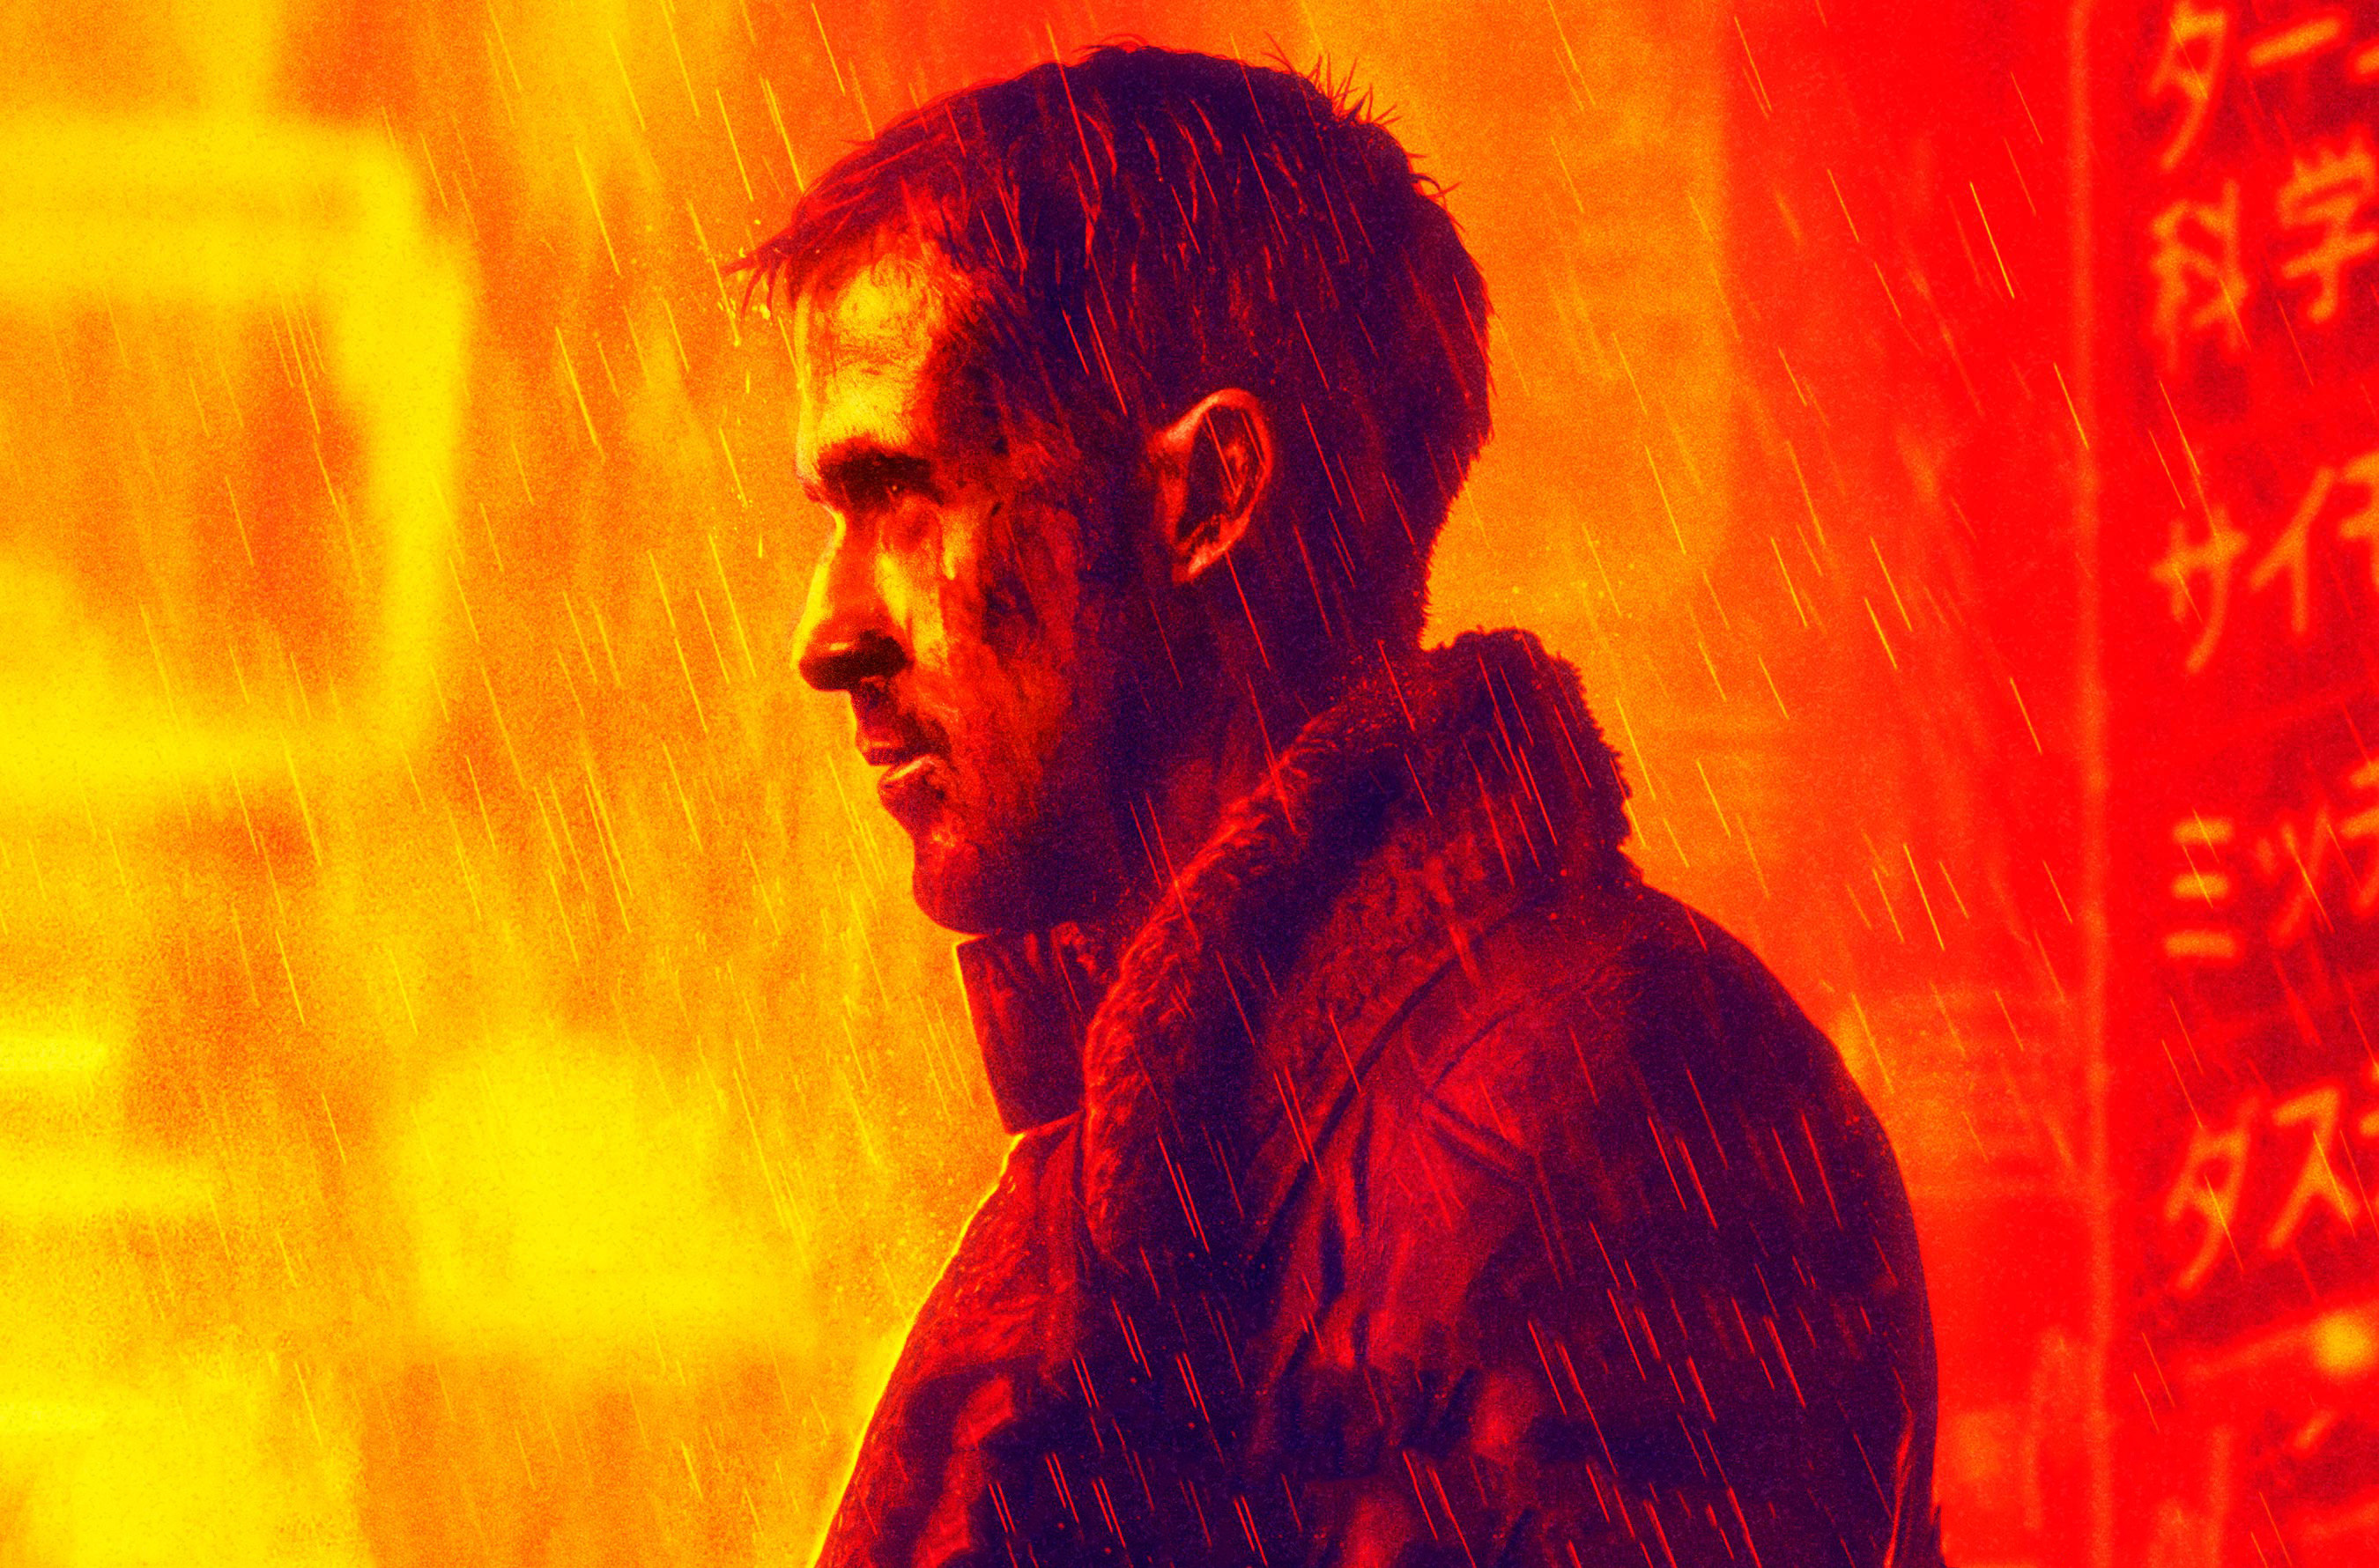 Res: 2700x1780, Ryan Gosling Blade Runner 2049